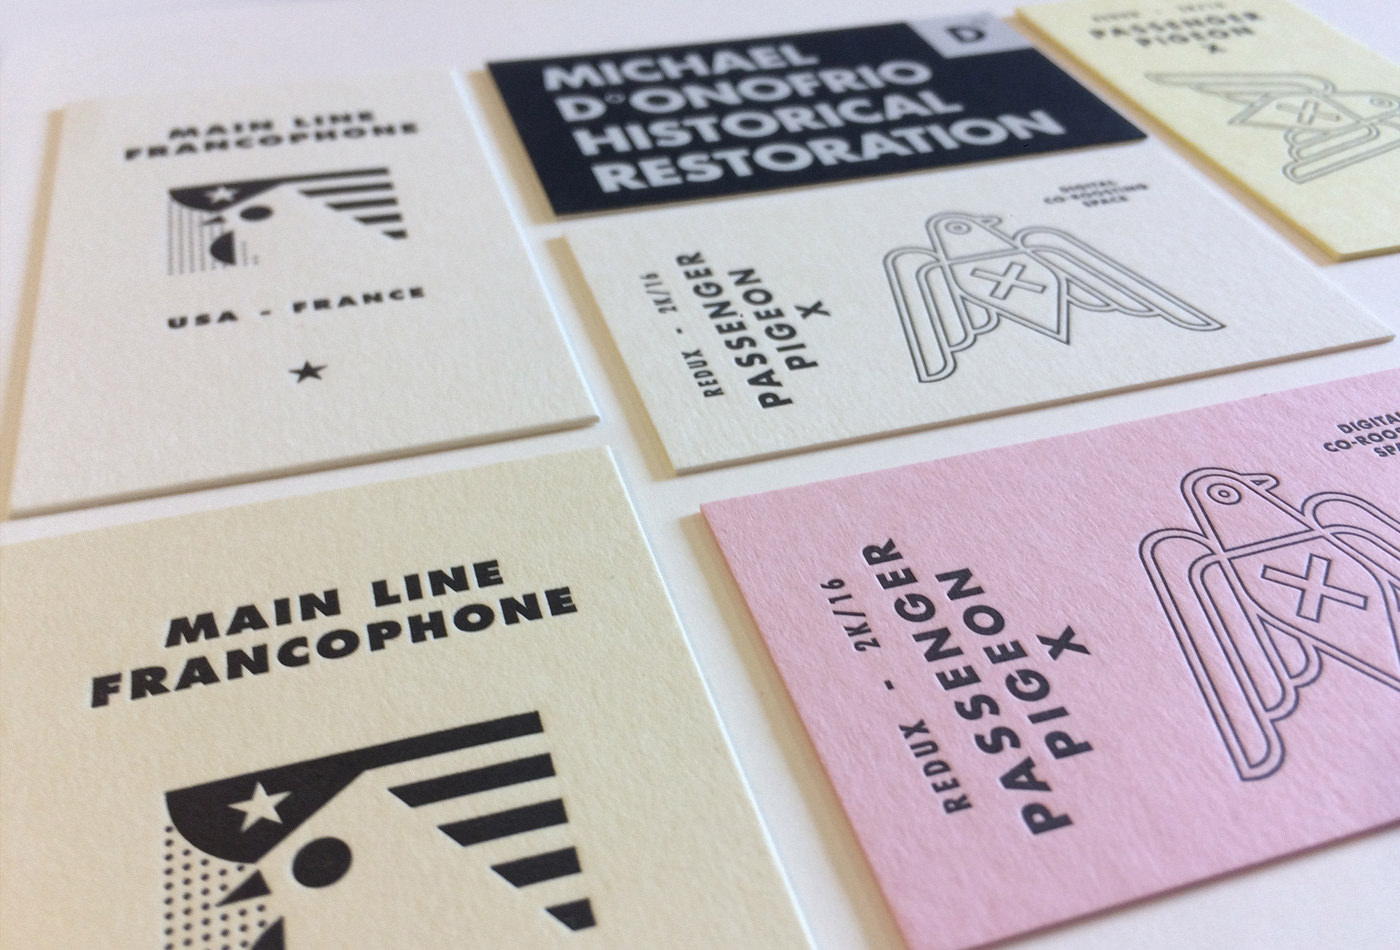 donofrio-passengerpigeonx-mainlinefrancophone-letterpress